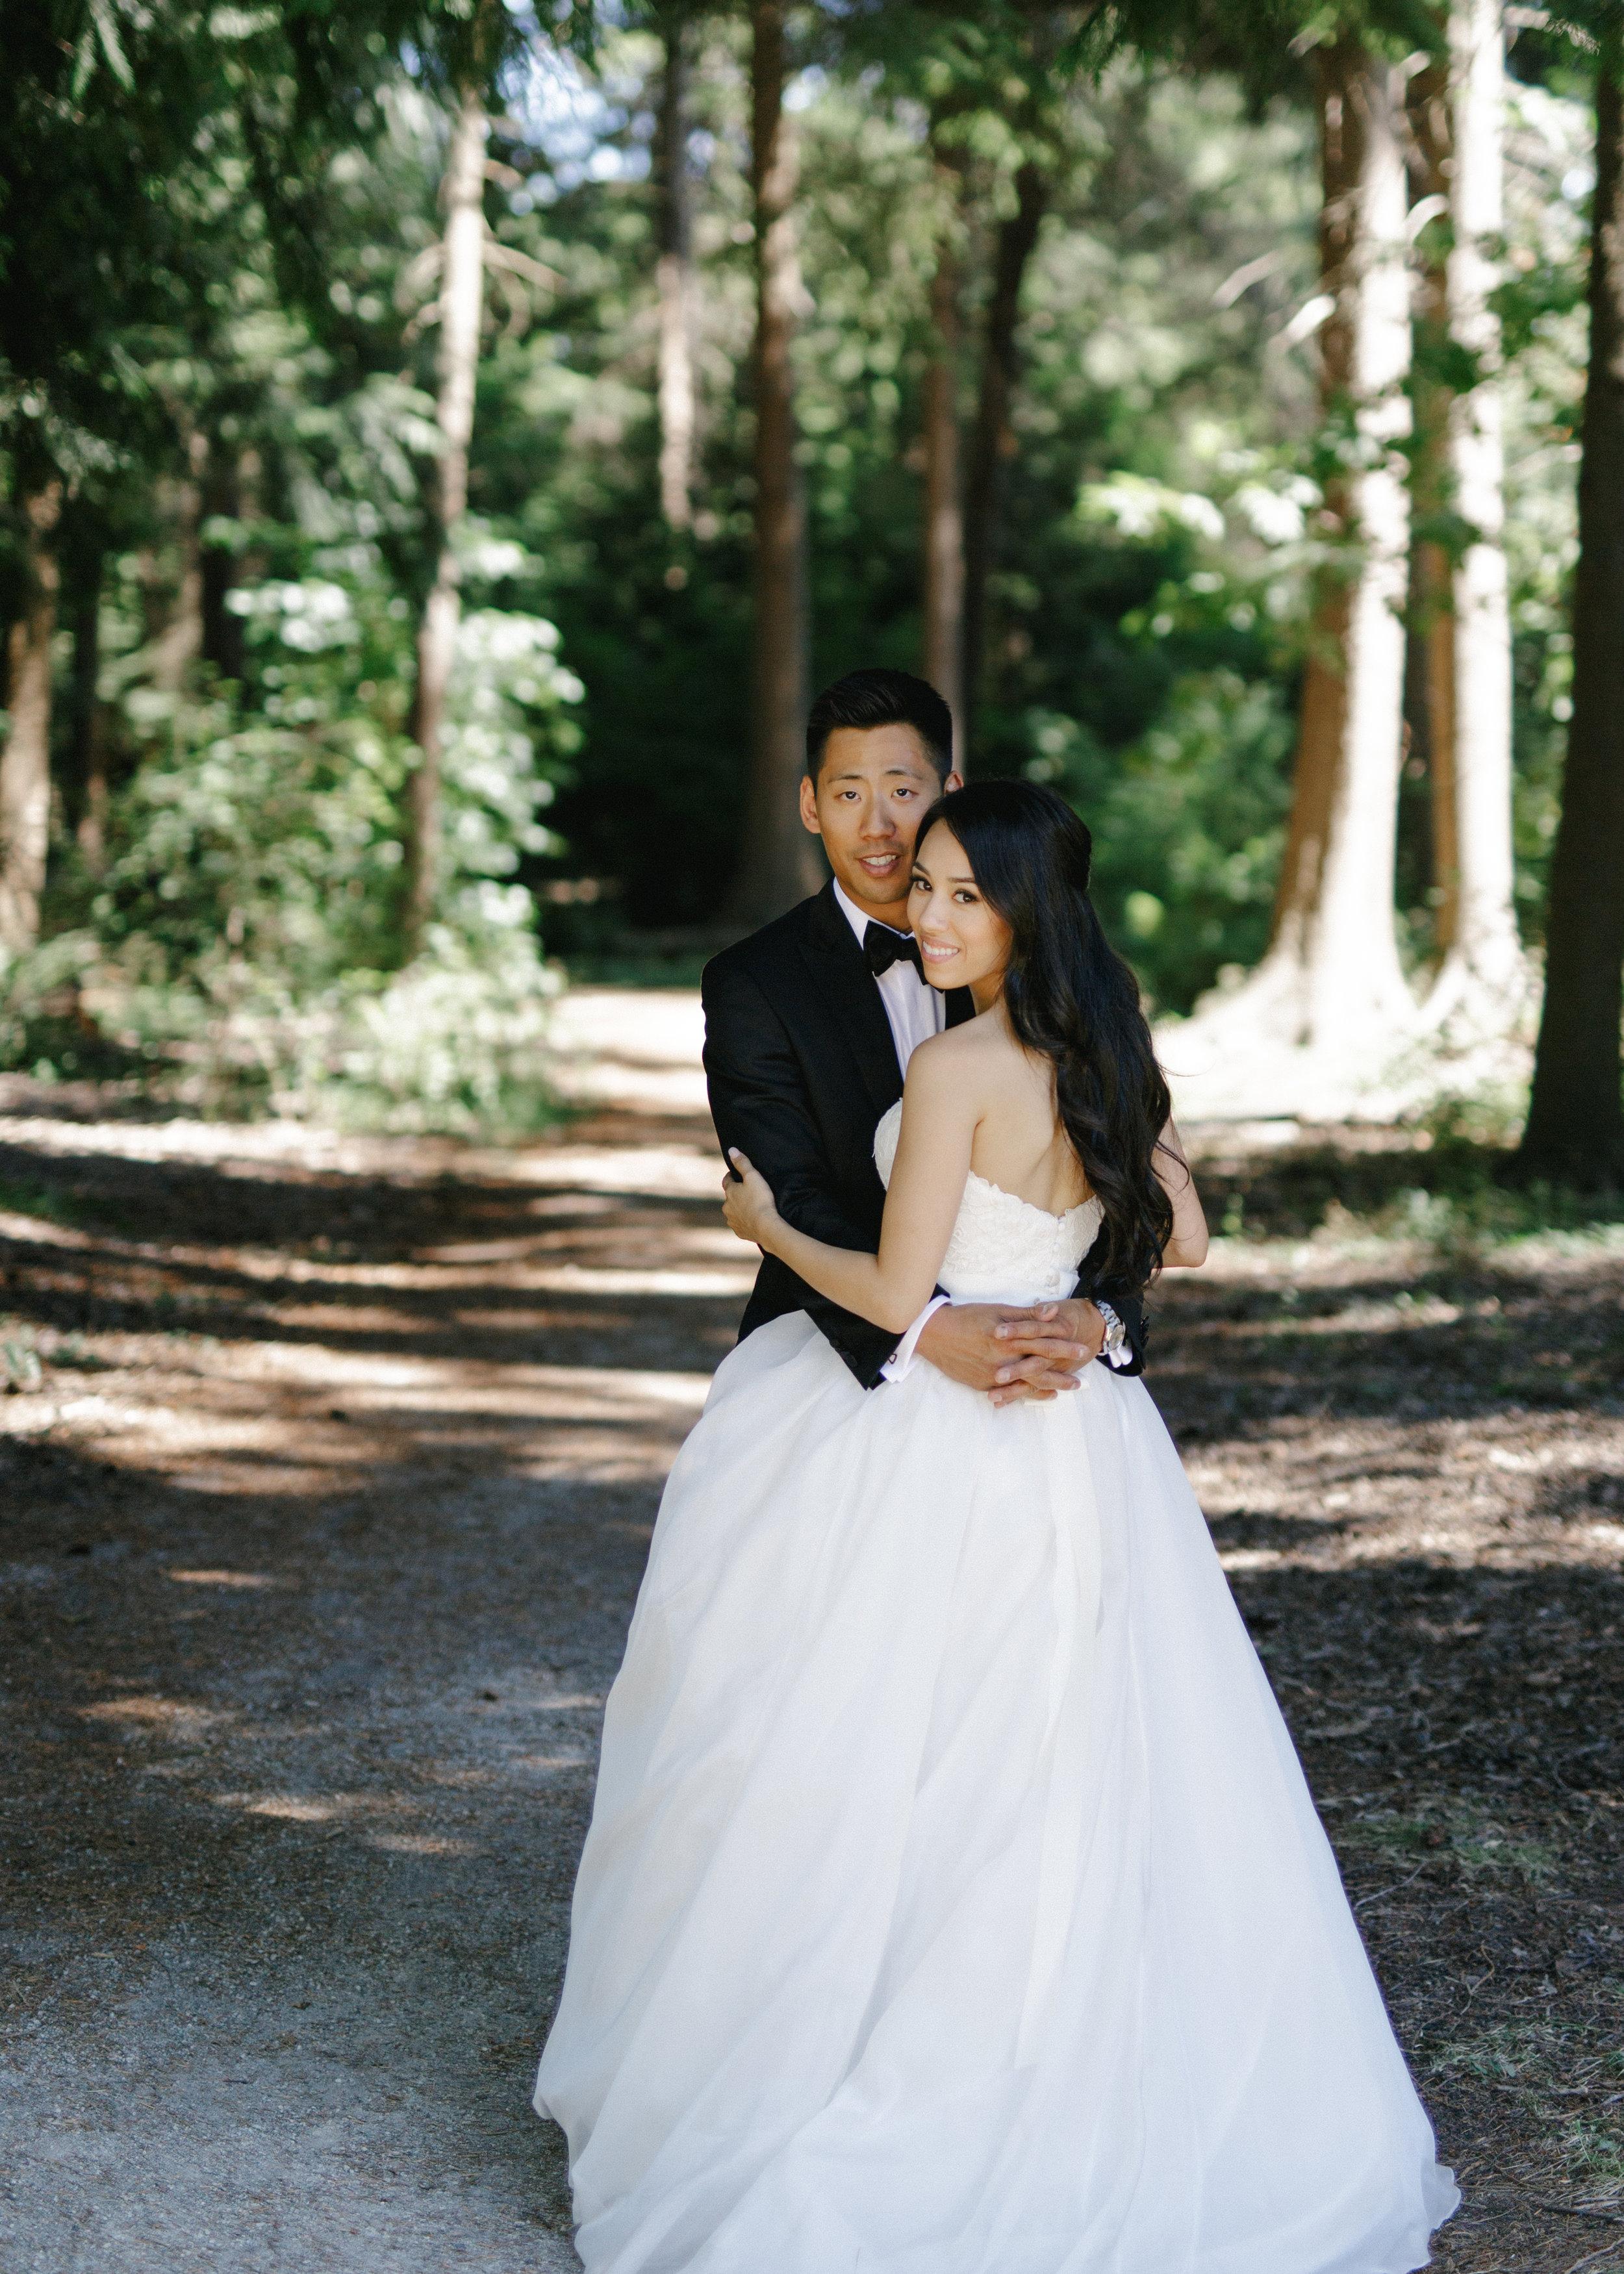 herafilms_wedding_priscilla_adrian_hera_selects-27.jpg